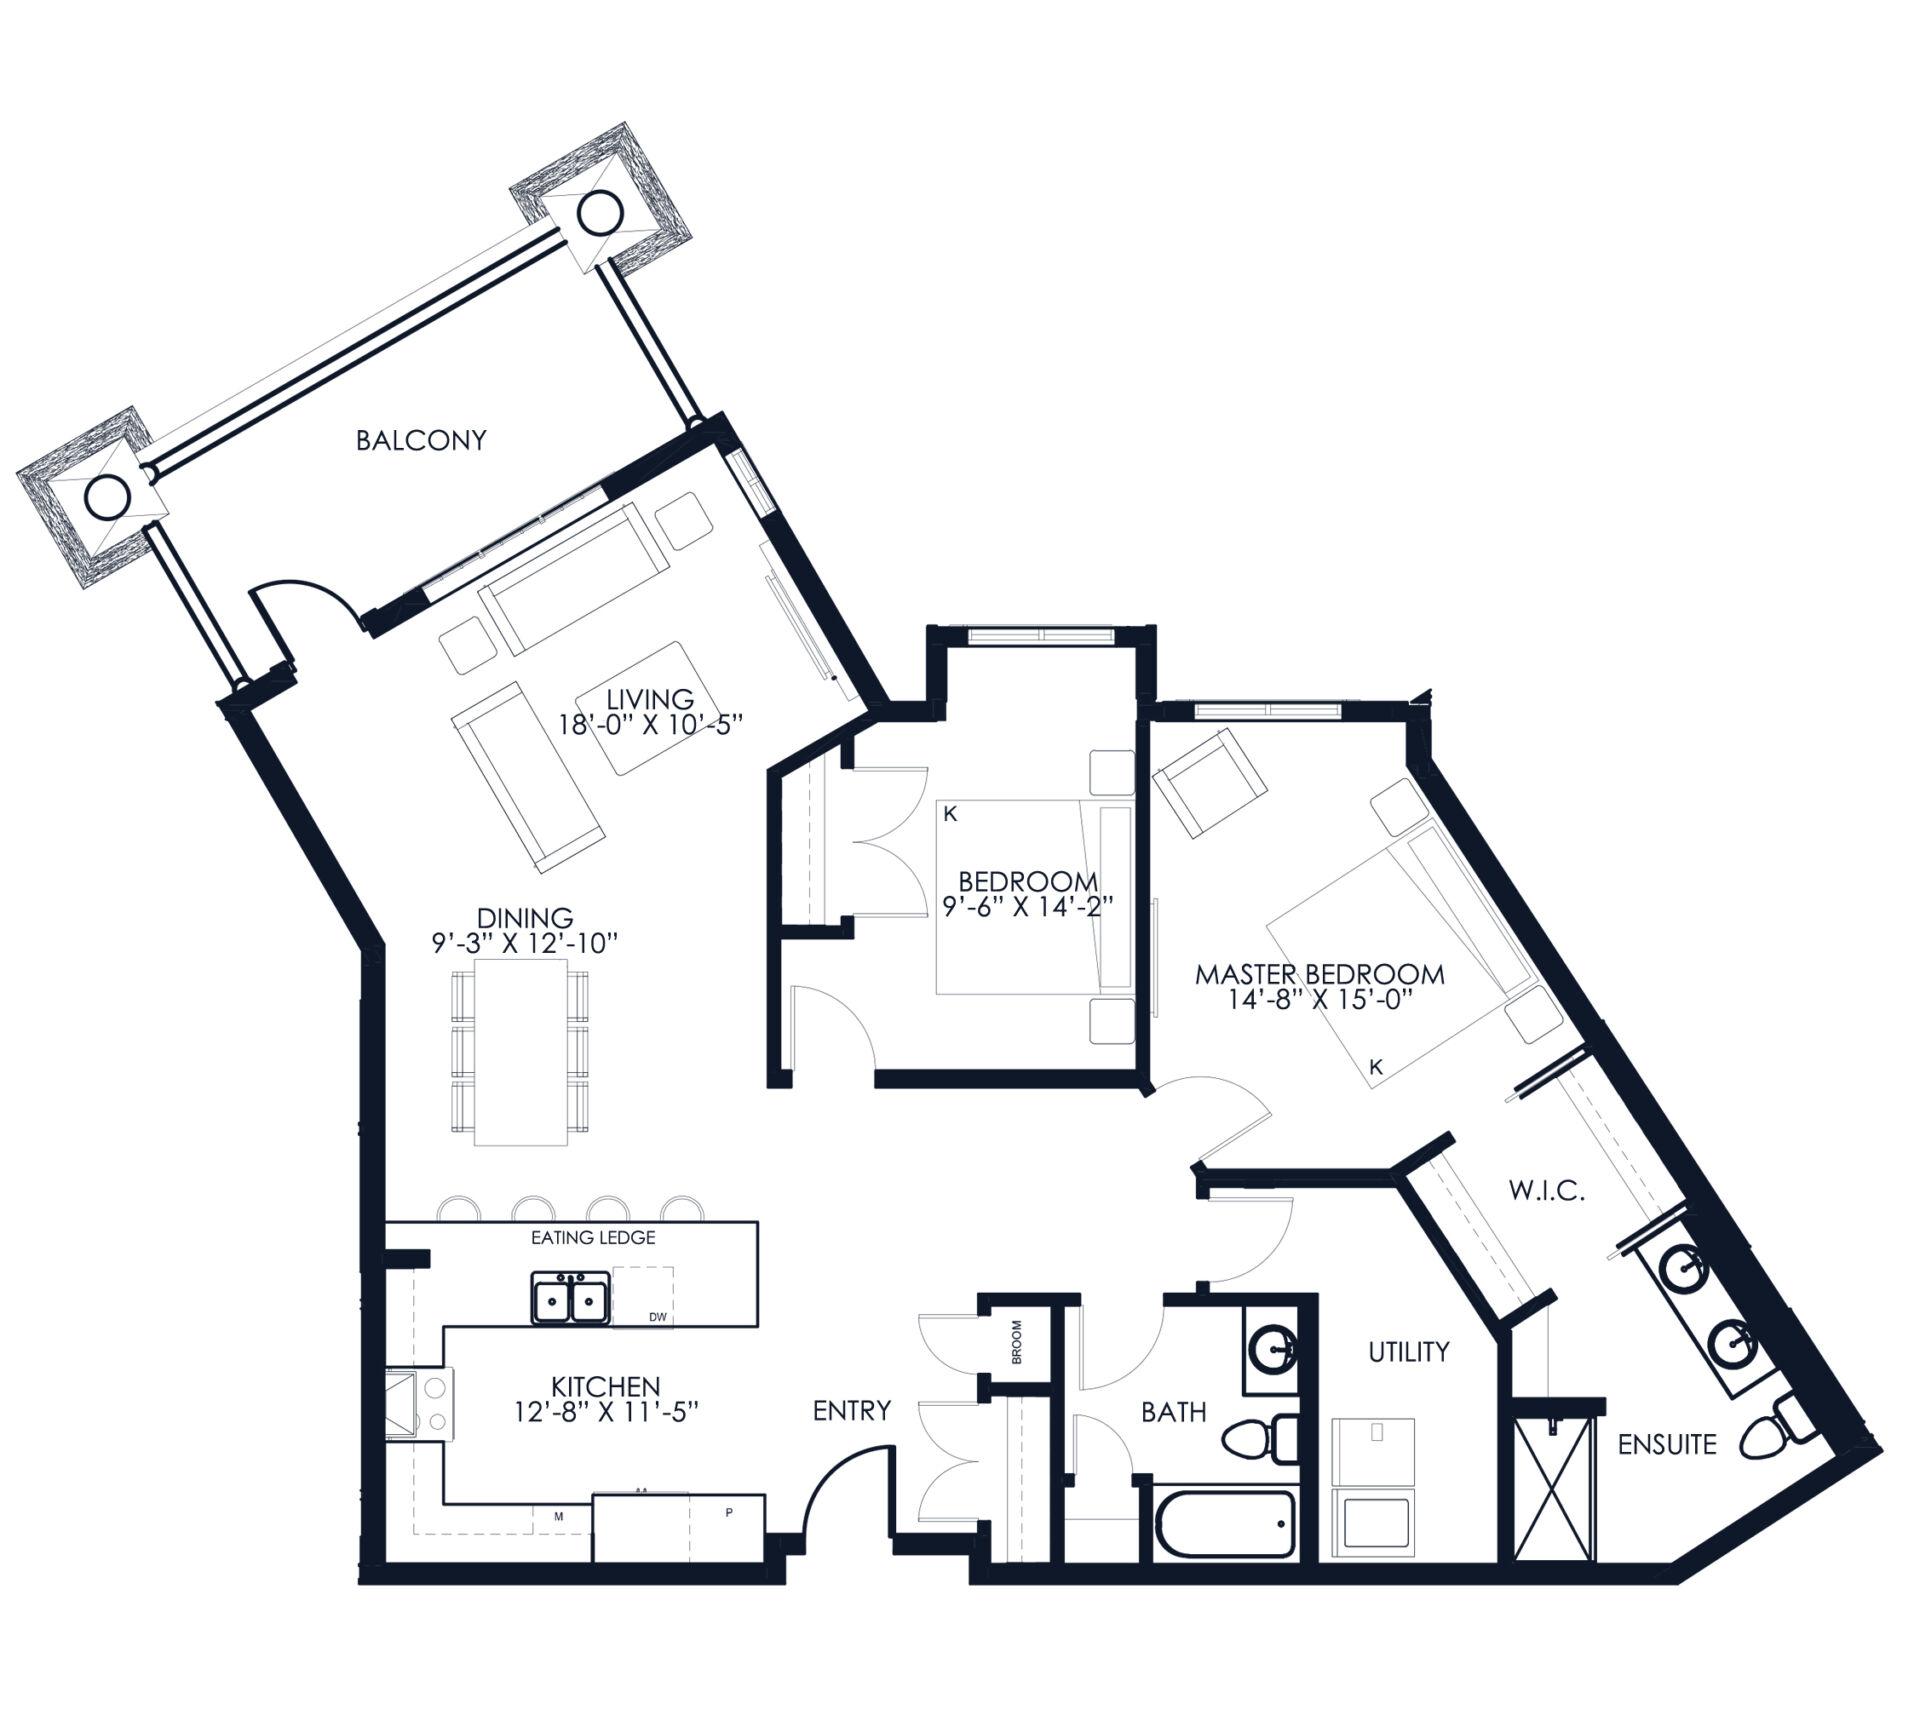 Unit A112-212-213 floor plan